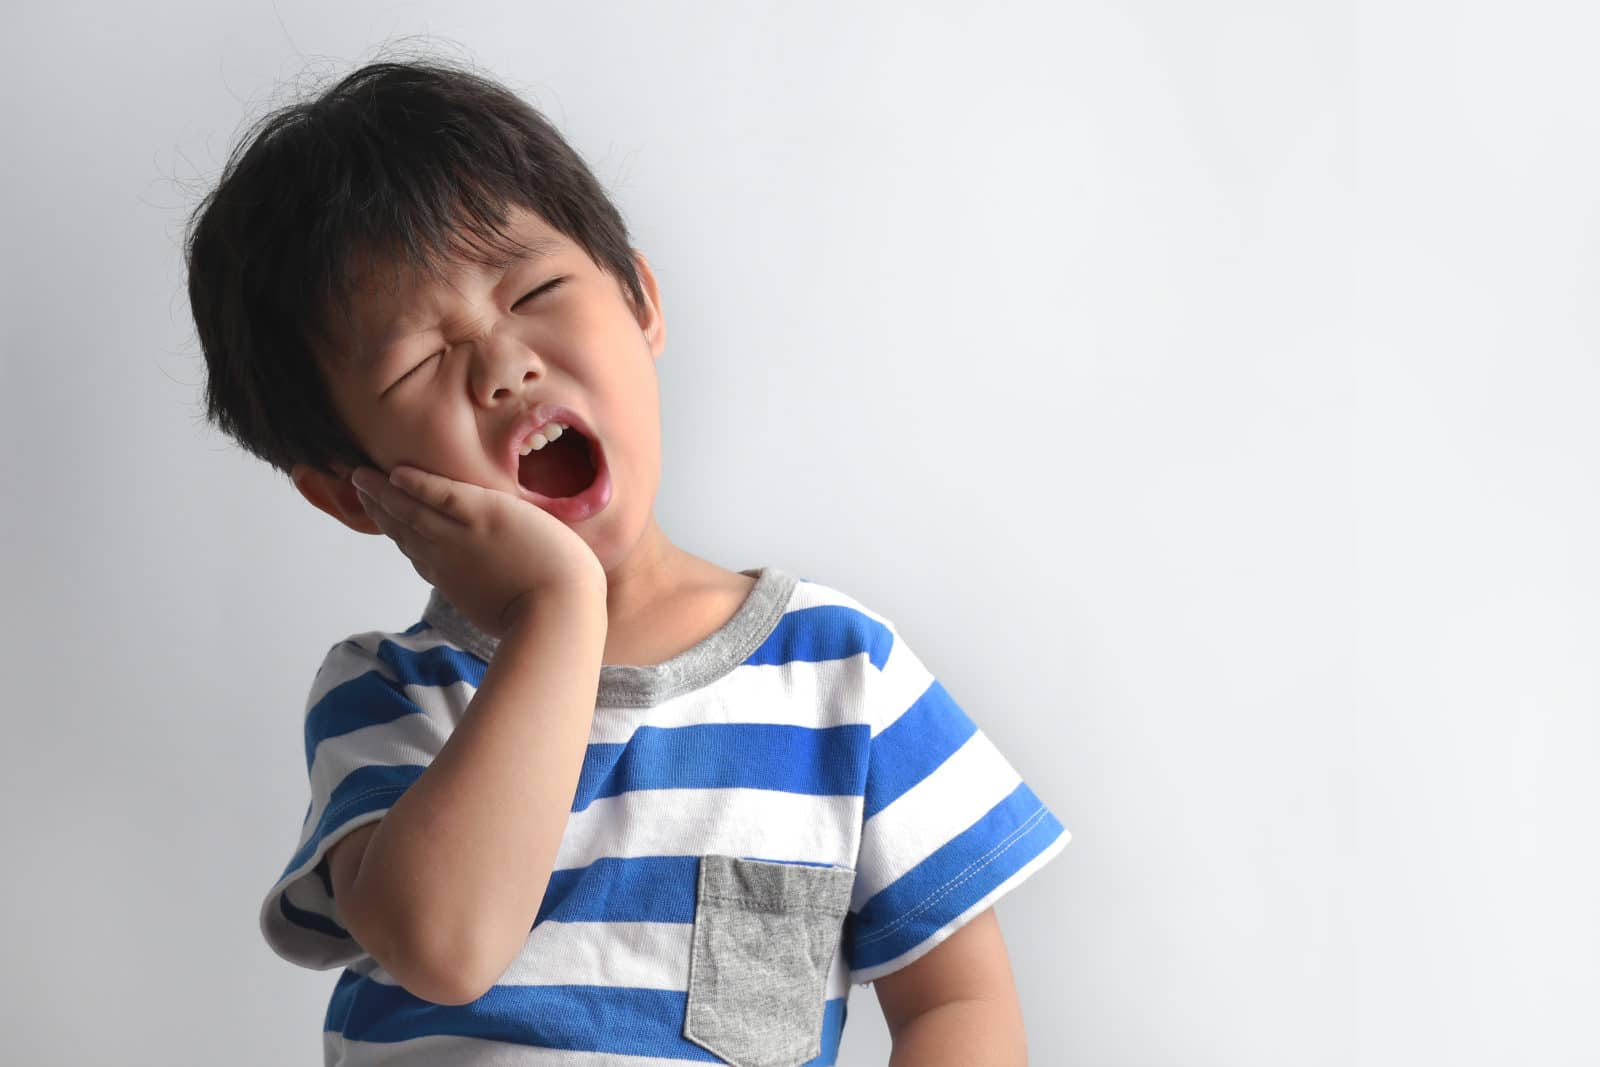 teeth grinding in children, 5 Tips for Preventing Teeth Grinding in Children